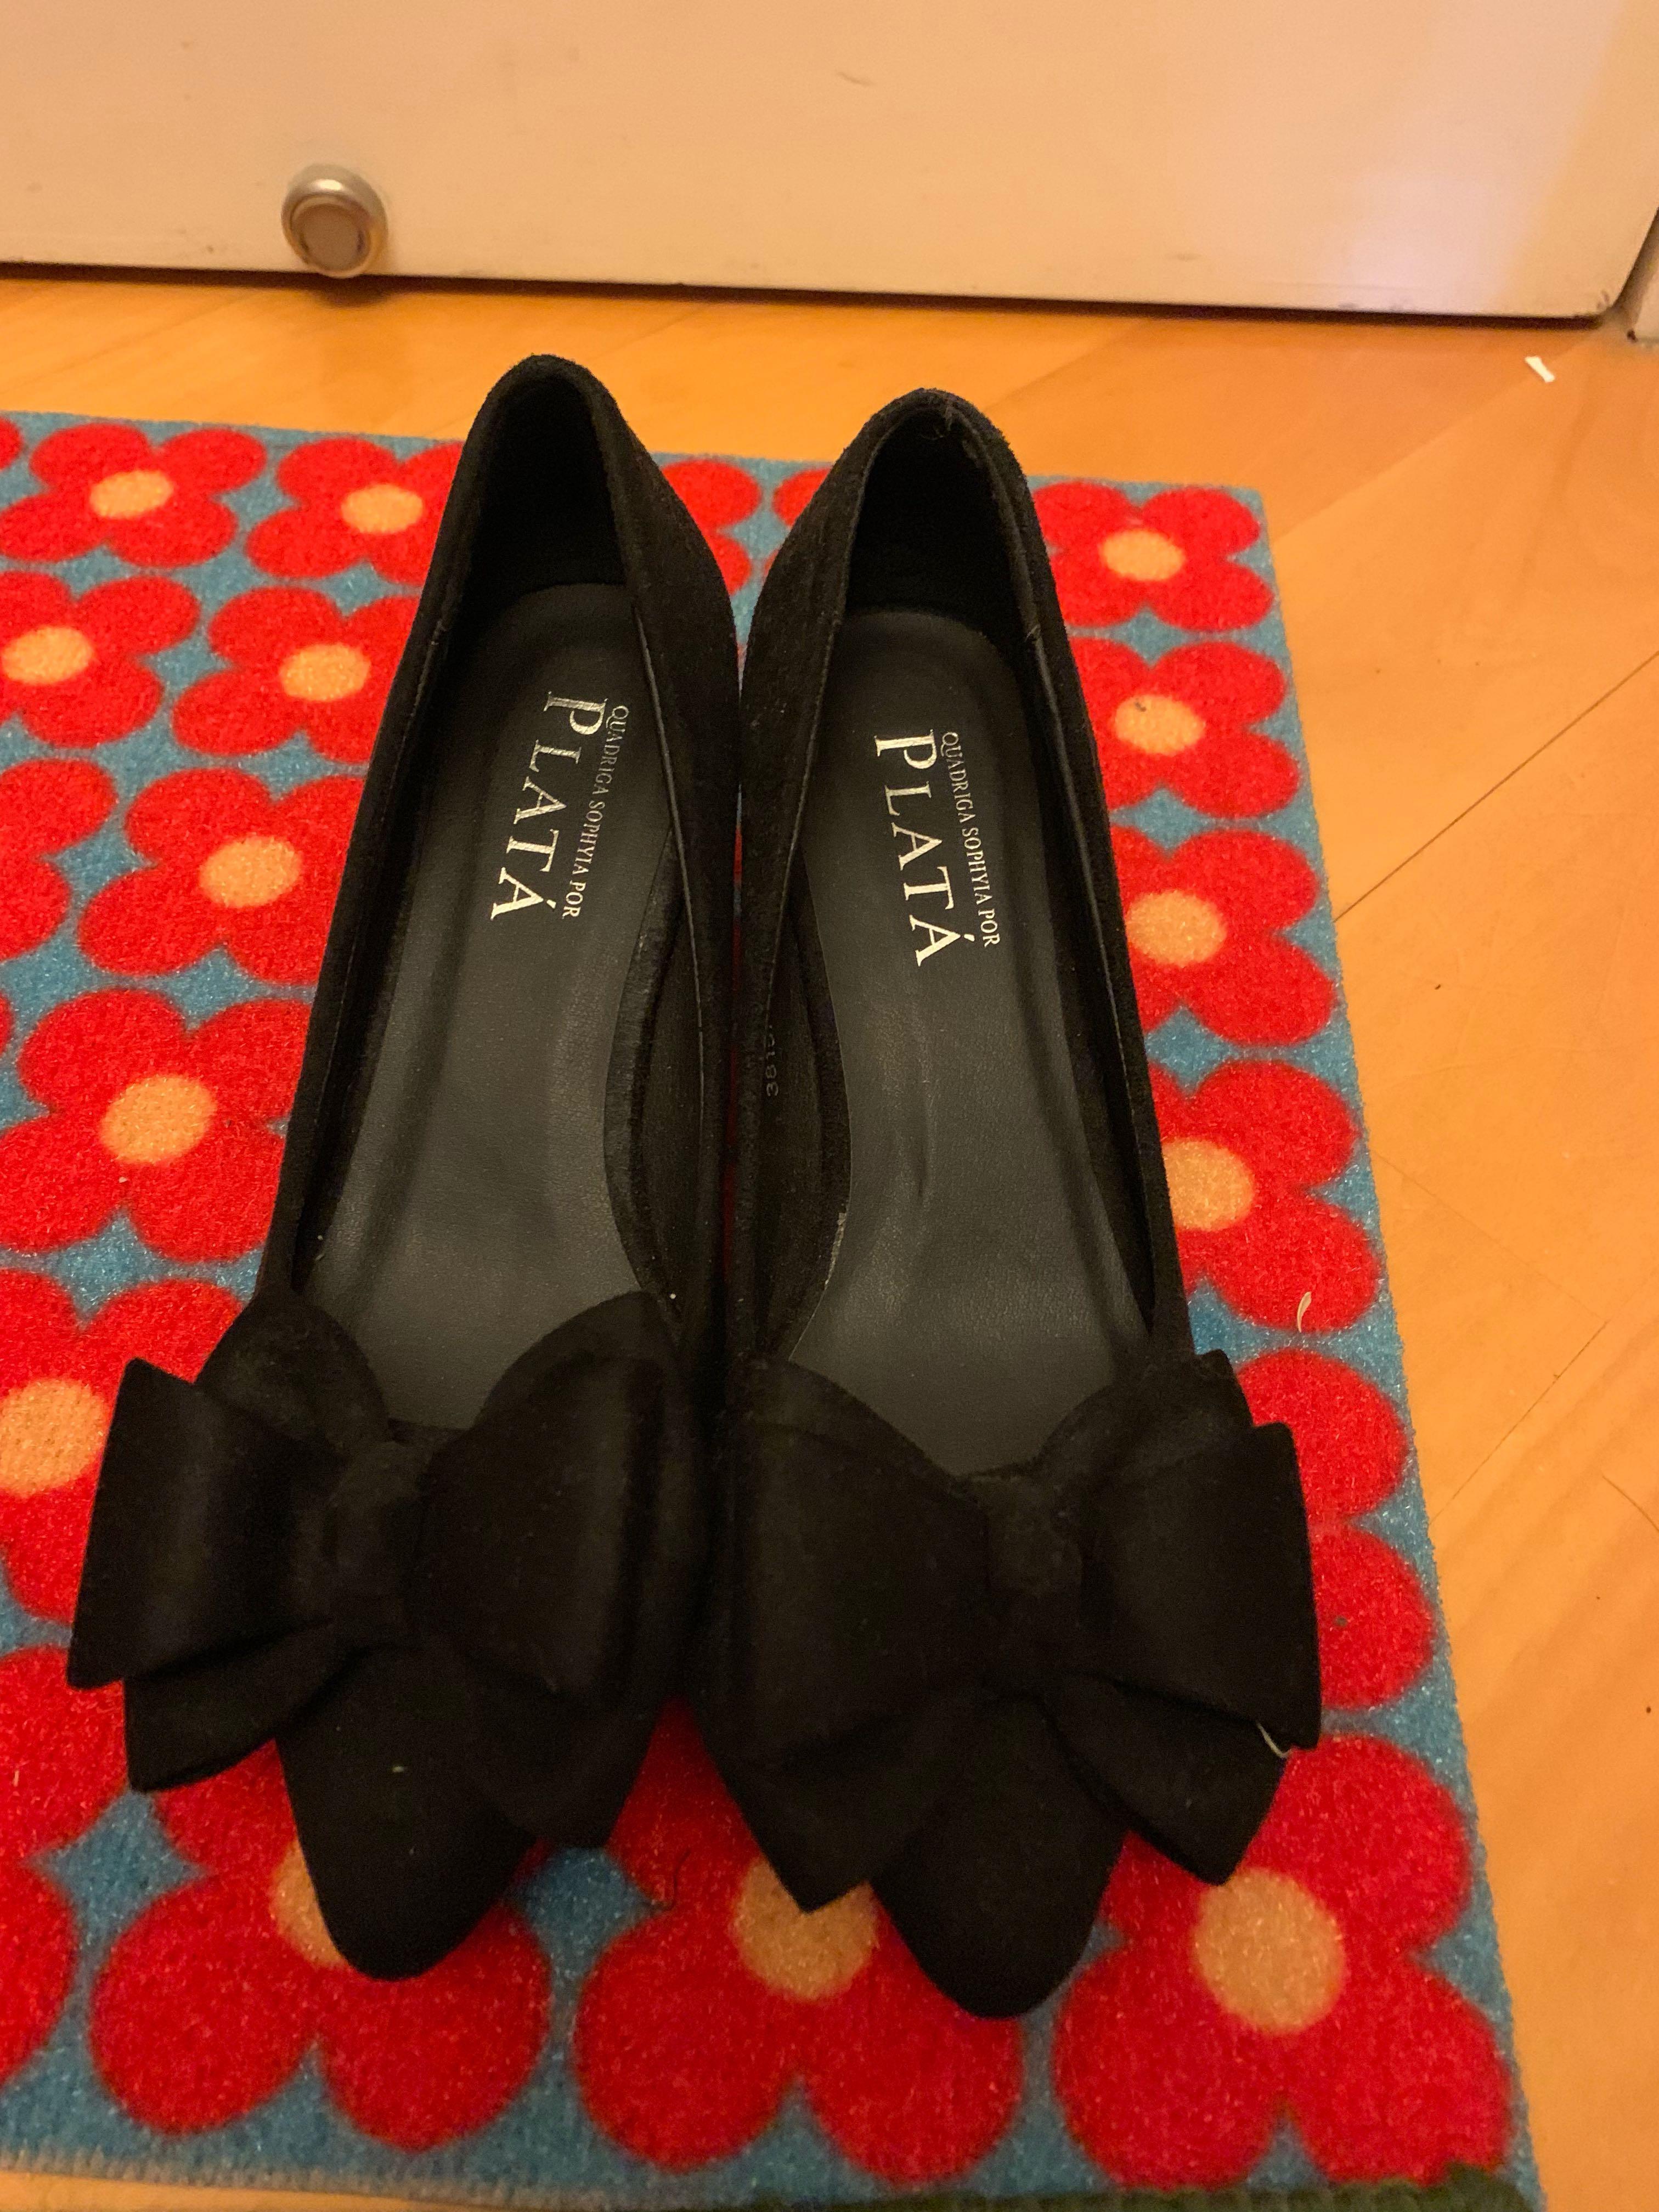 Plata (Playlord) 闊踭高踭鞋(全新)